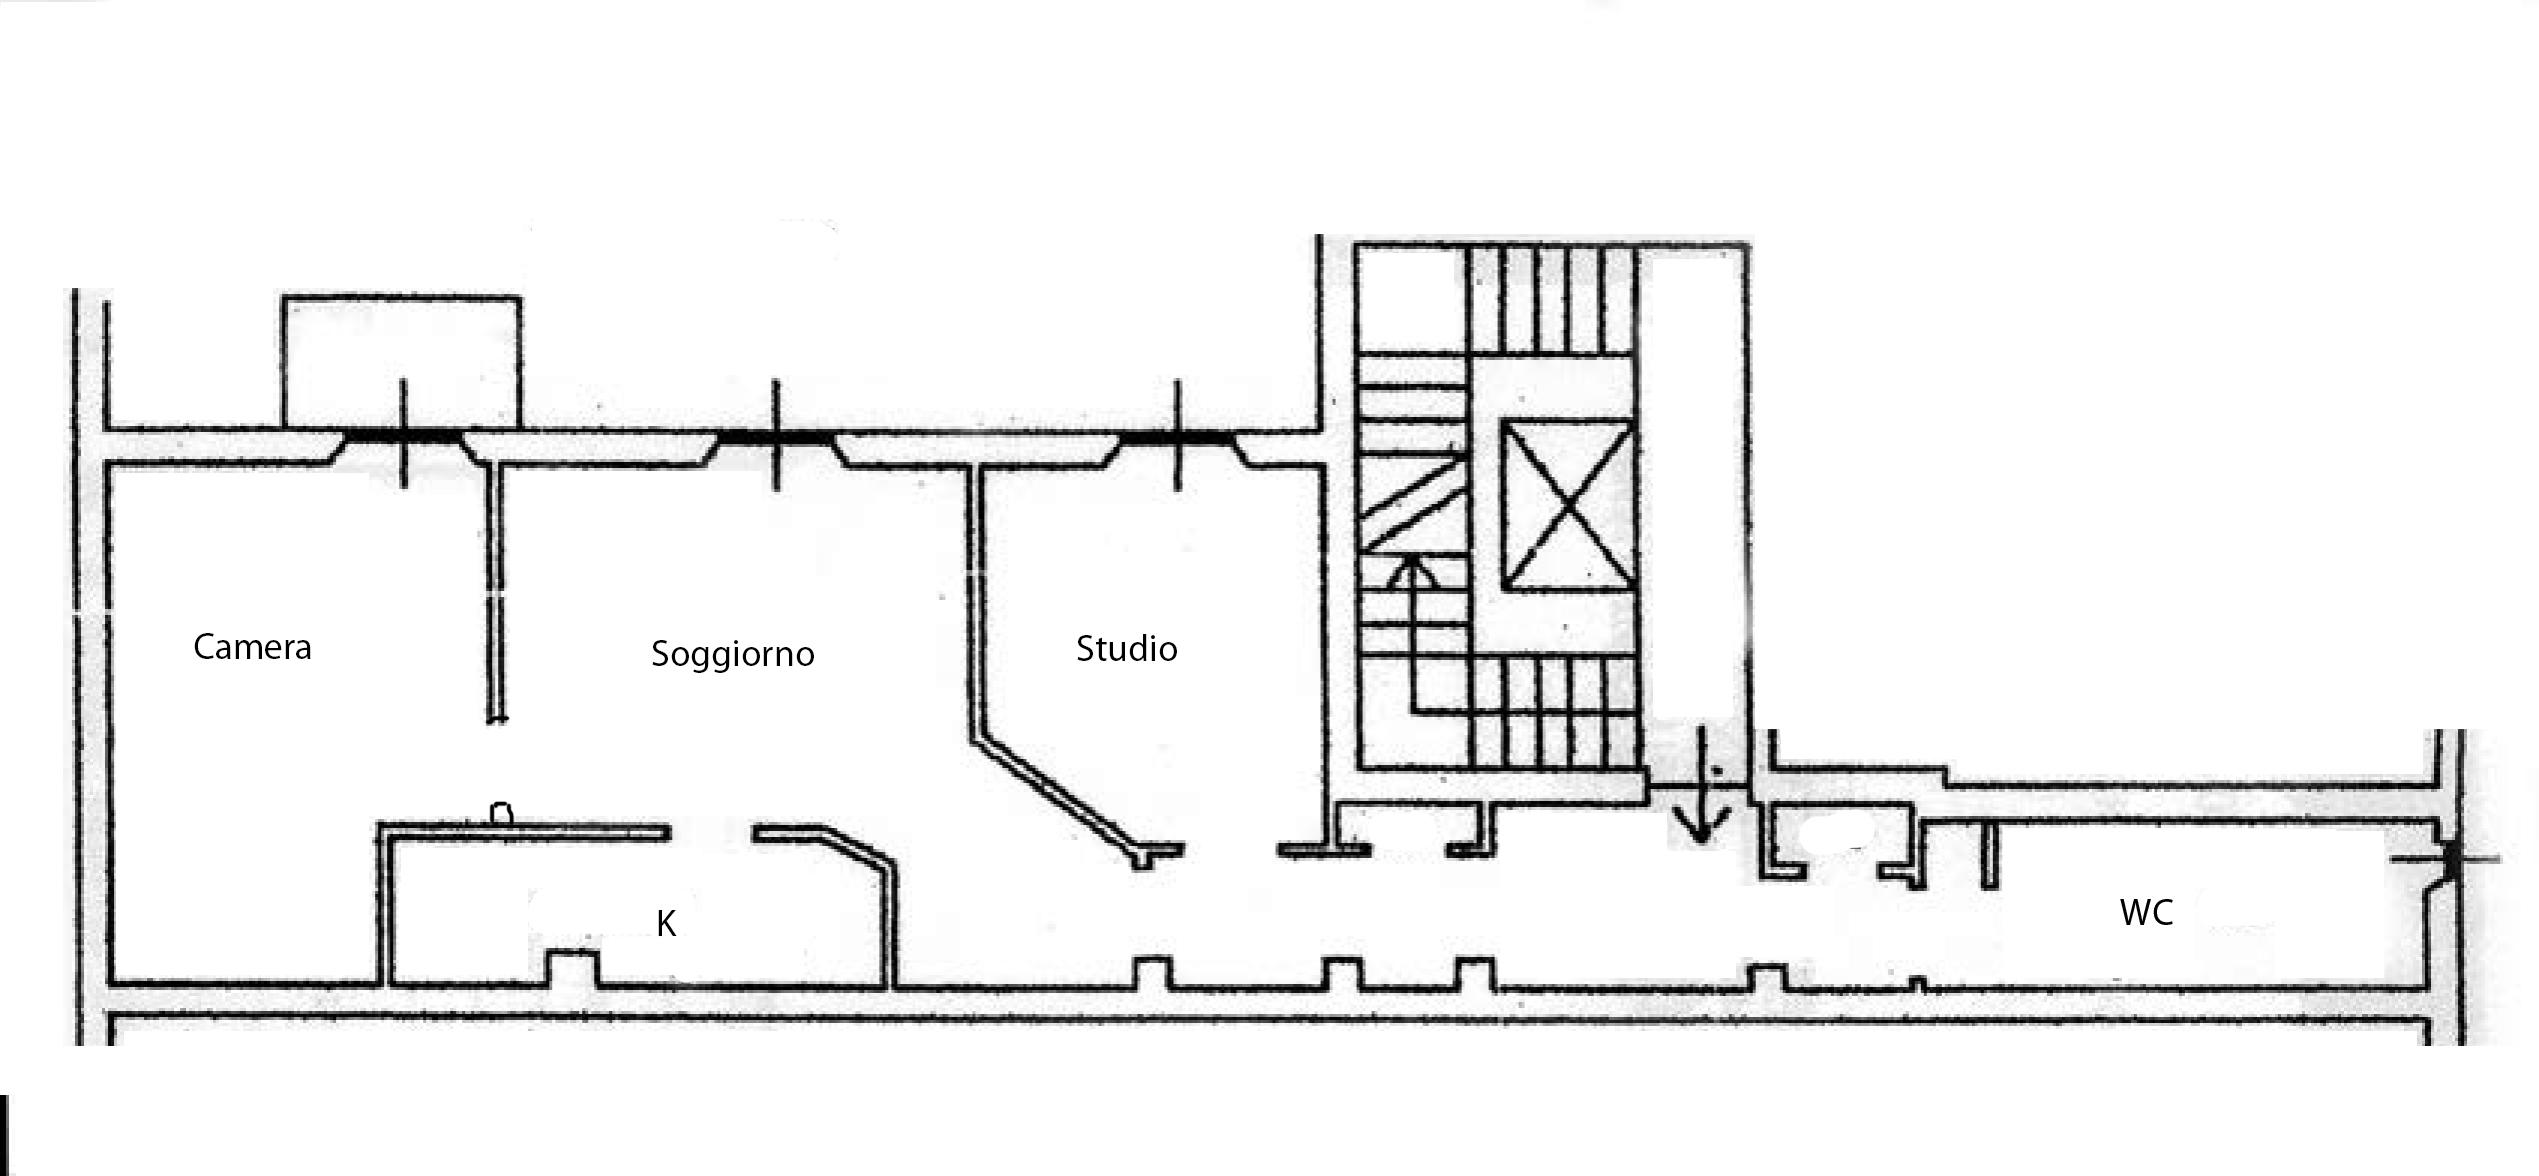 planimetrie/9mUfMAoSk7.jpg